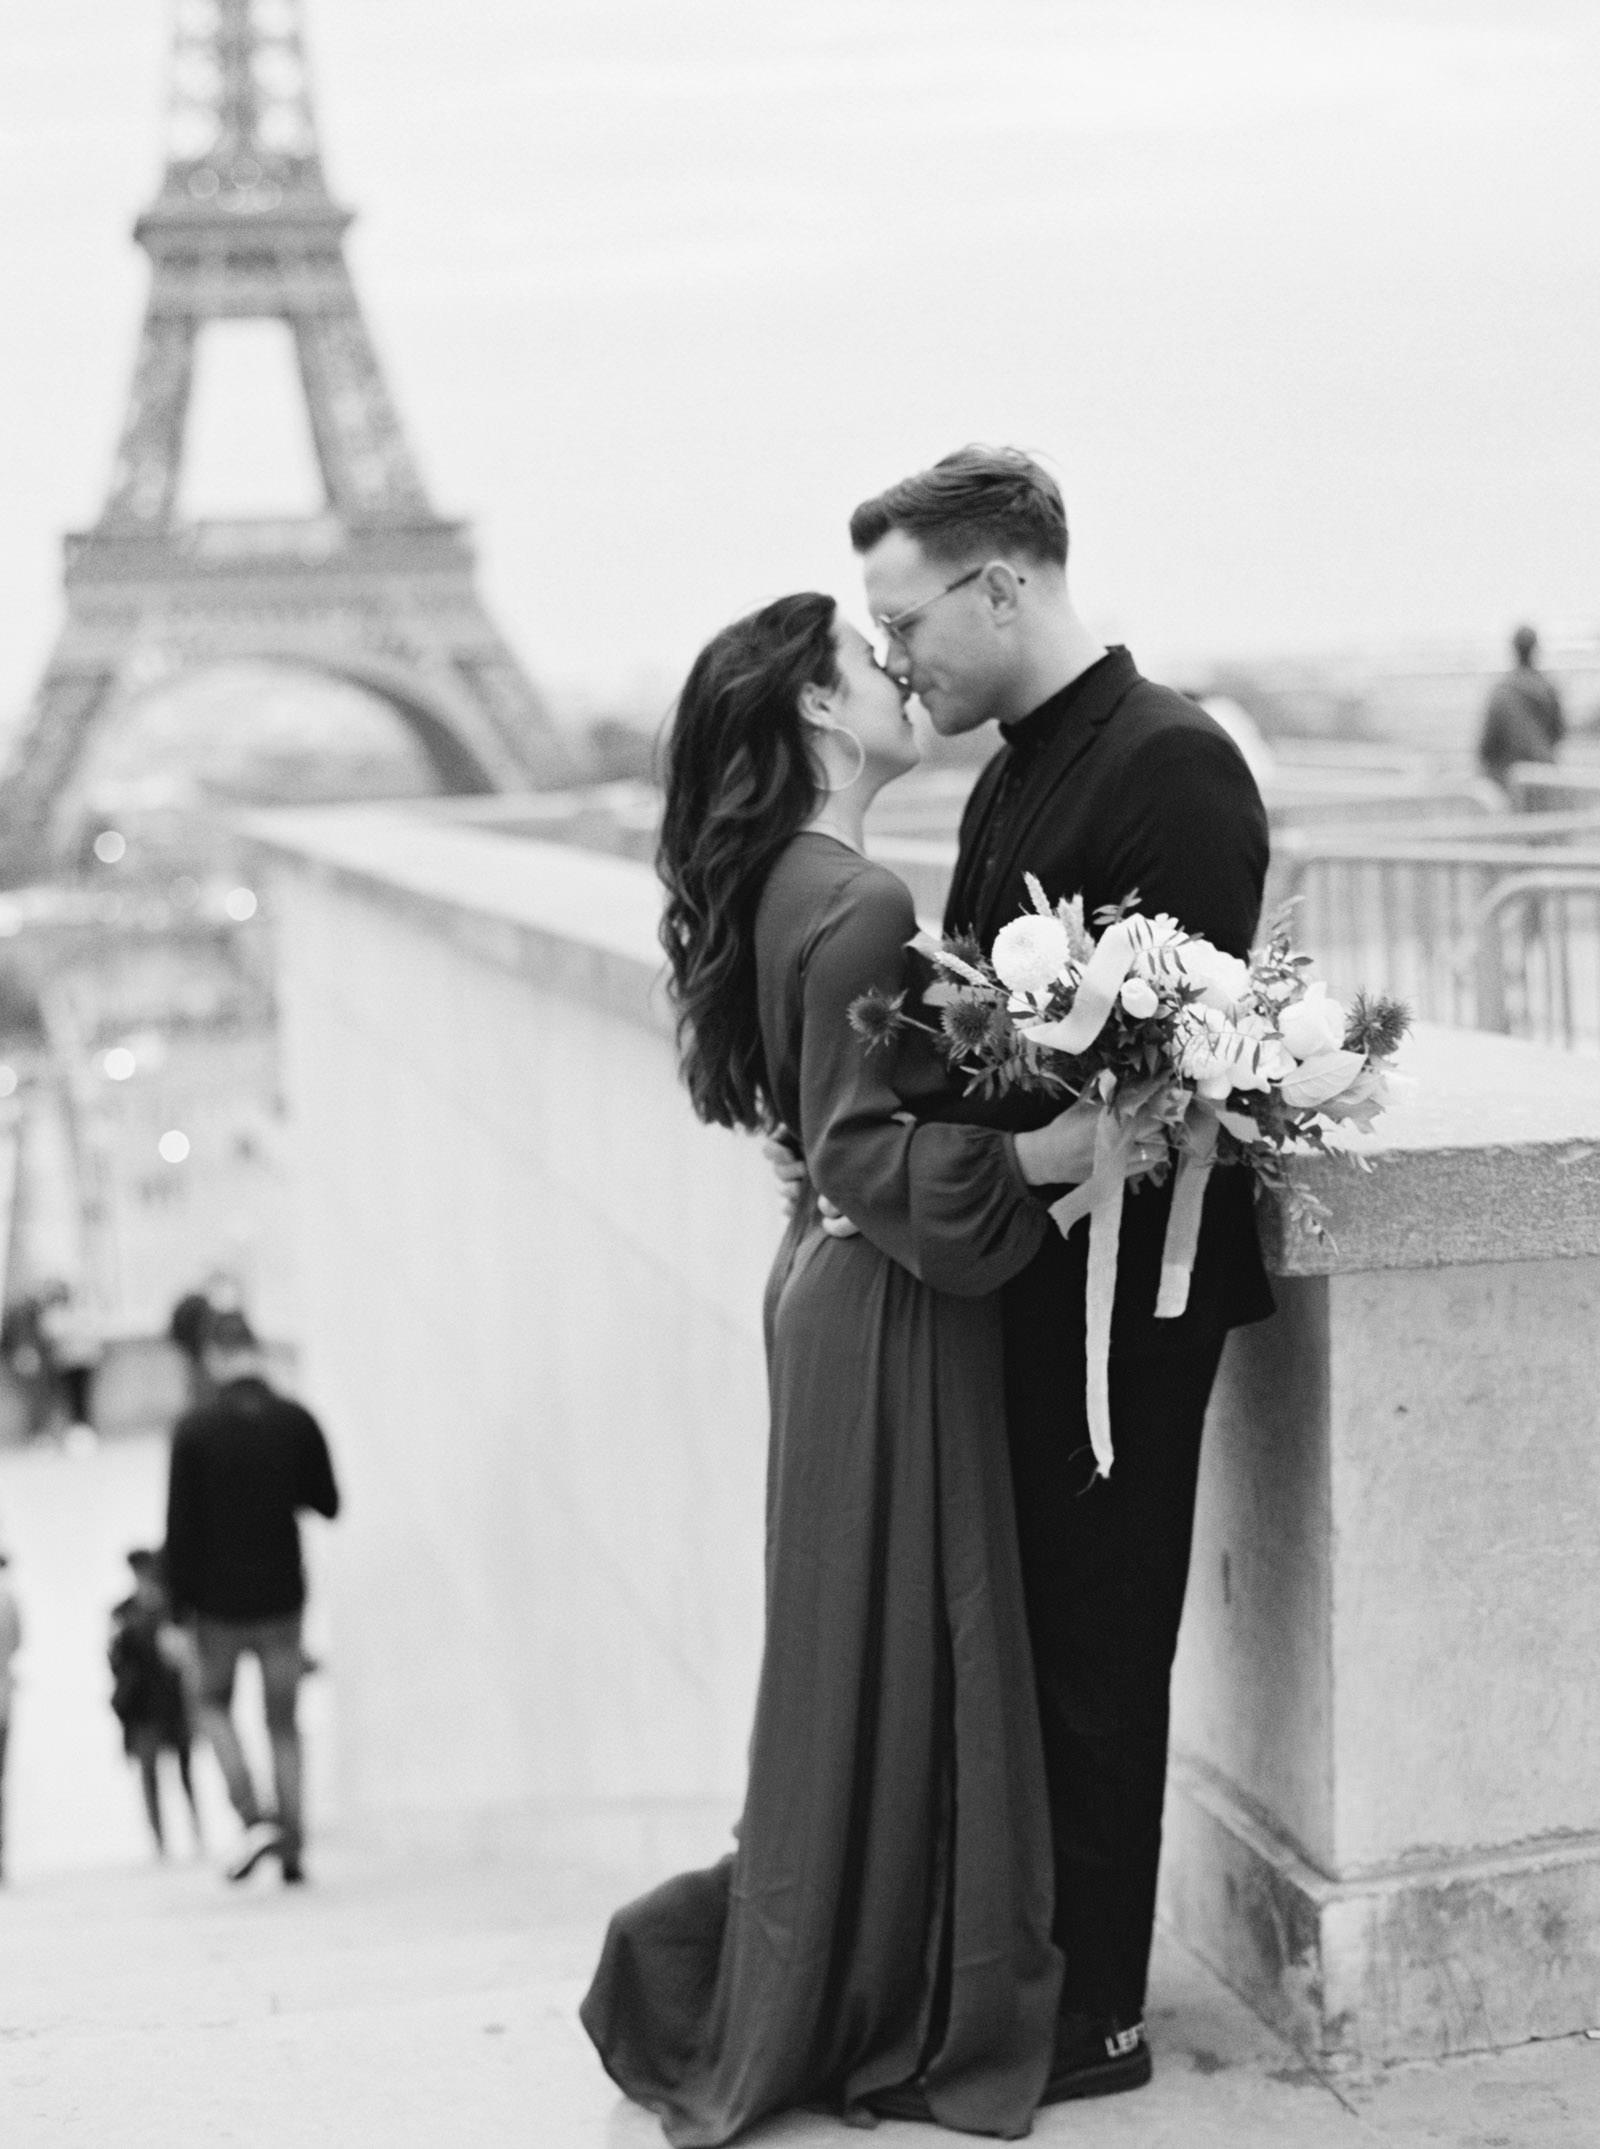 Romantic Eiffel Tower Engagement Photos - KR Moreno